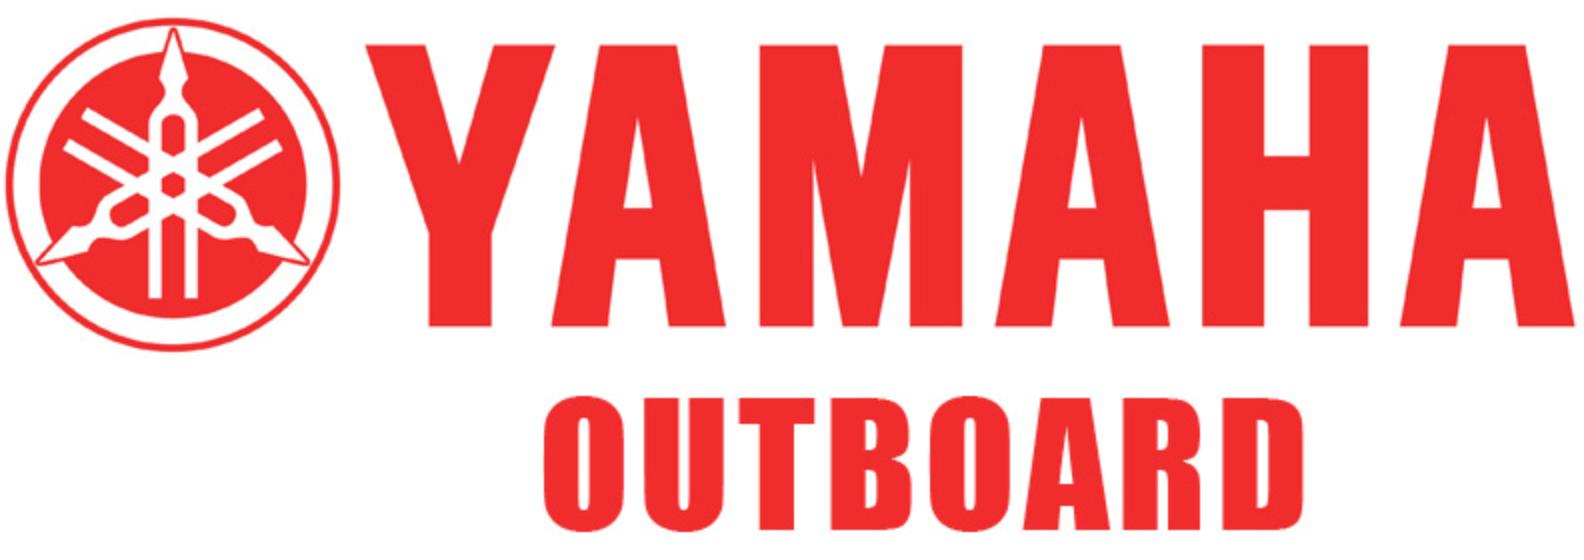 Yamaha Decal png.png